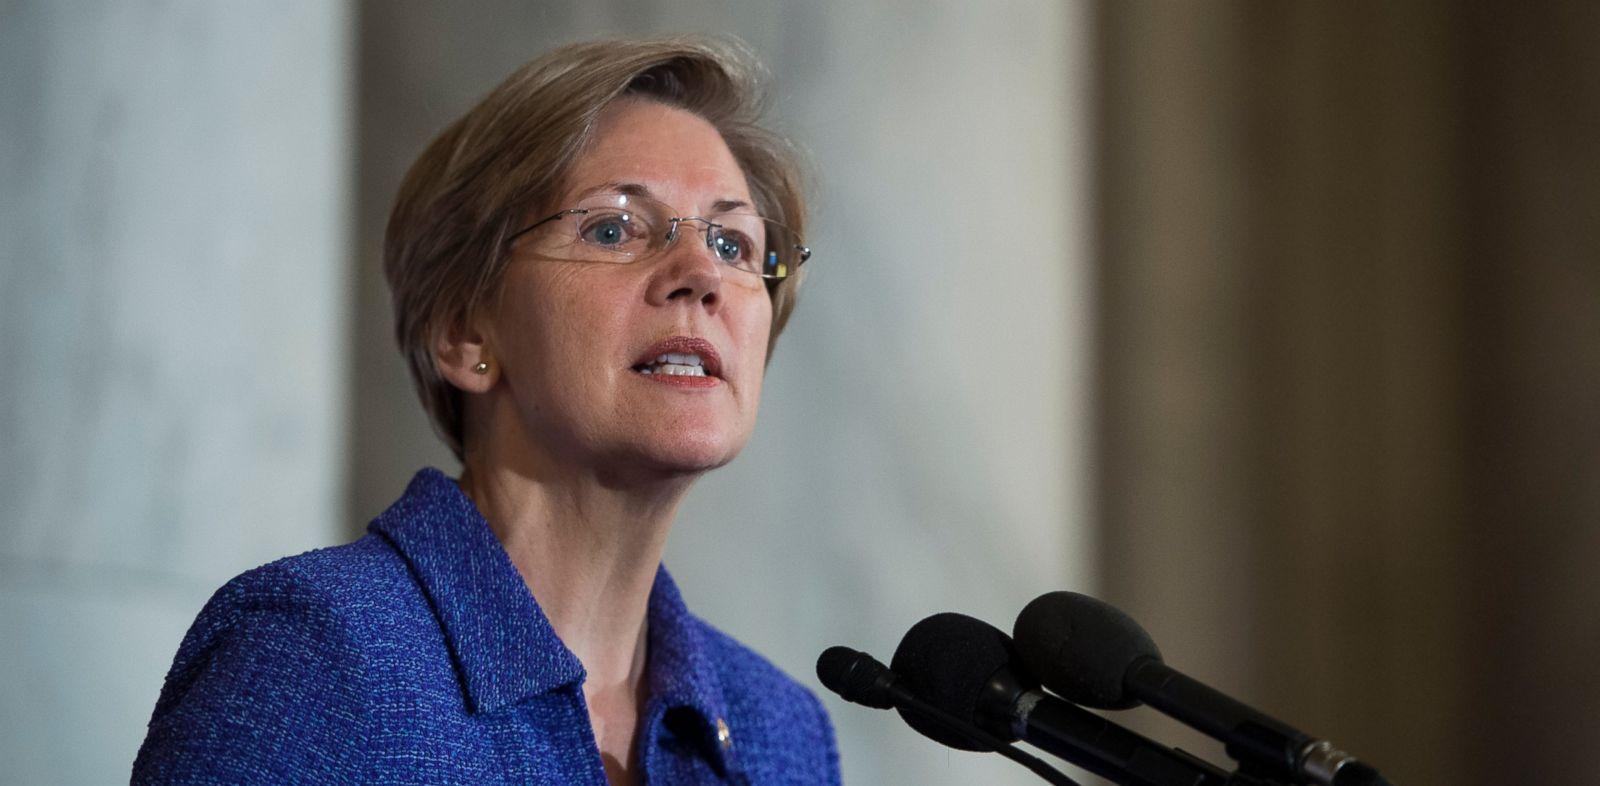 PHOTO: In this file photo, Sen. Elizabeth Warren is pictured on Nov. 12, 2013 in Washington, D.C.